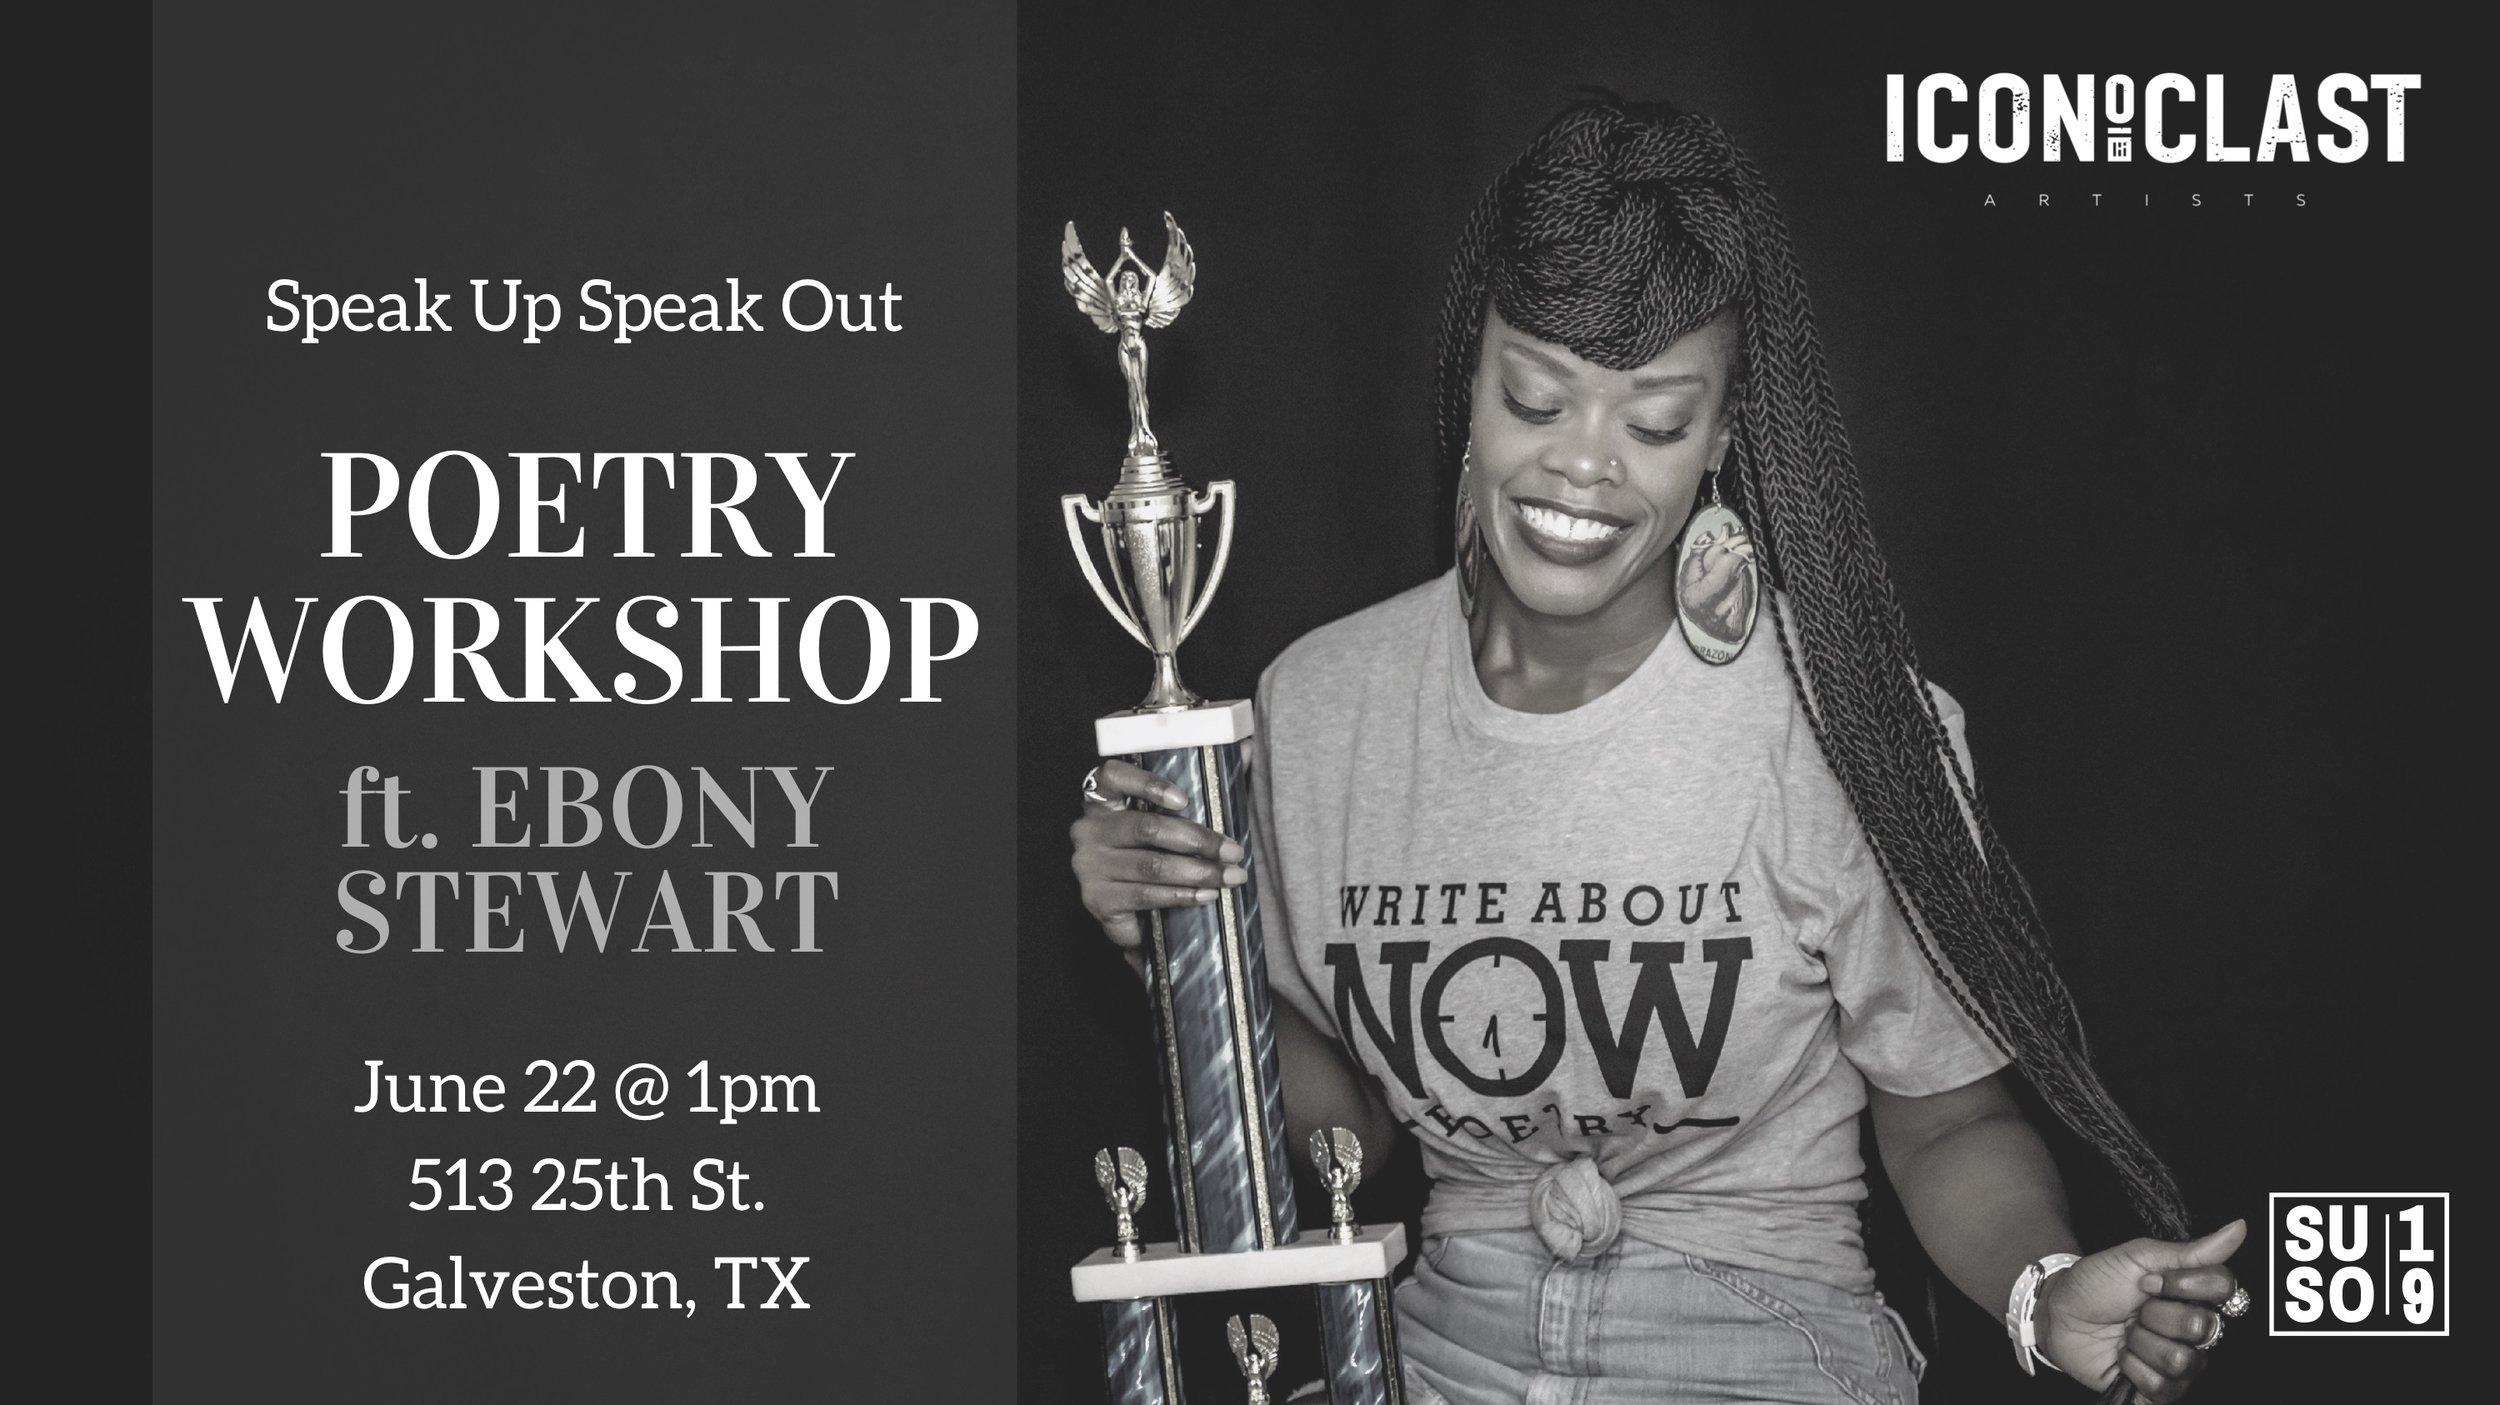 Register for Ebony's workshop HERE -